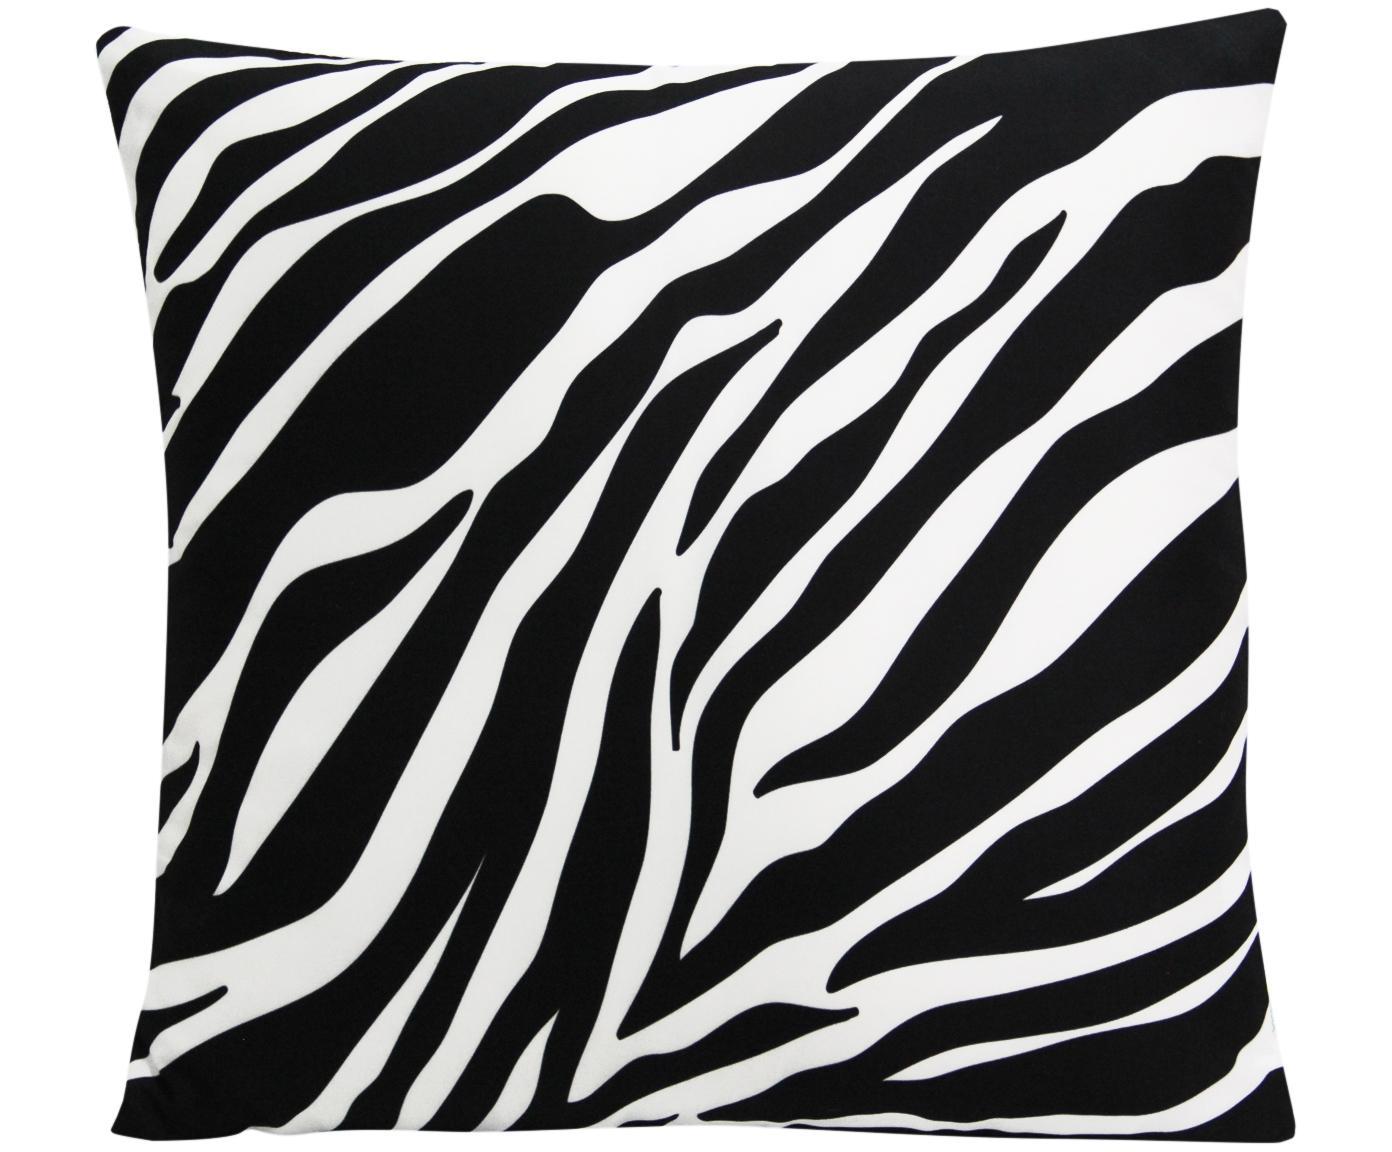 Federa arredo reversibile Zebra Pattern, 100% poliestere, Bianco, nero, Larg. 45 x Lung. 45 cm